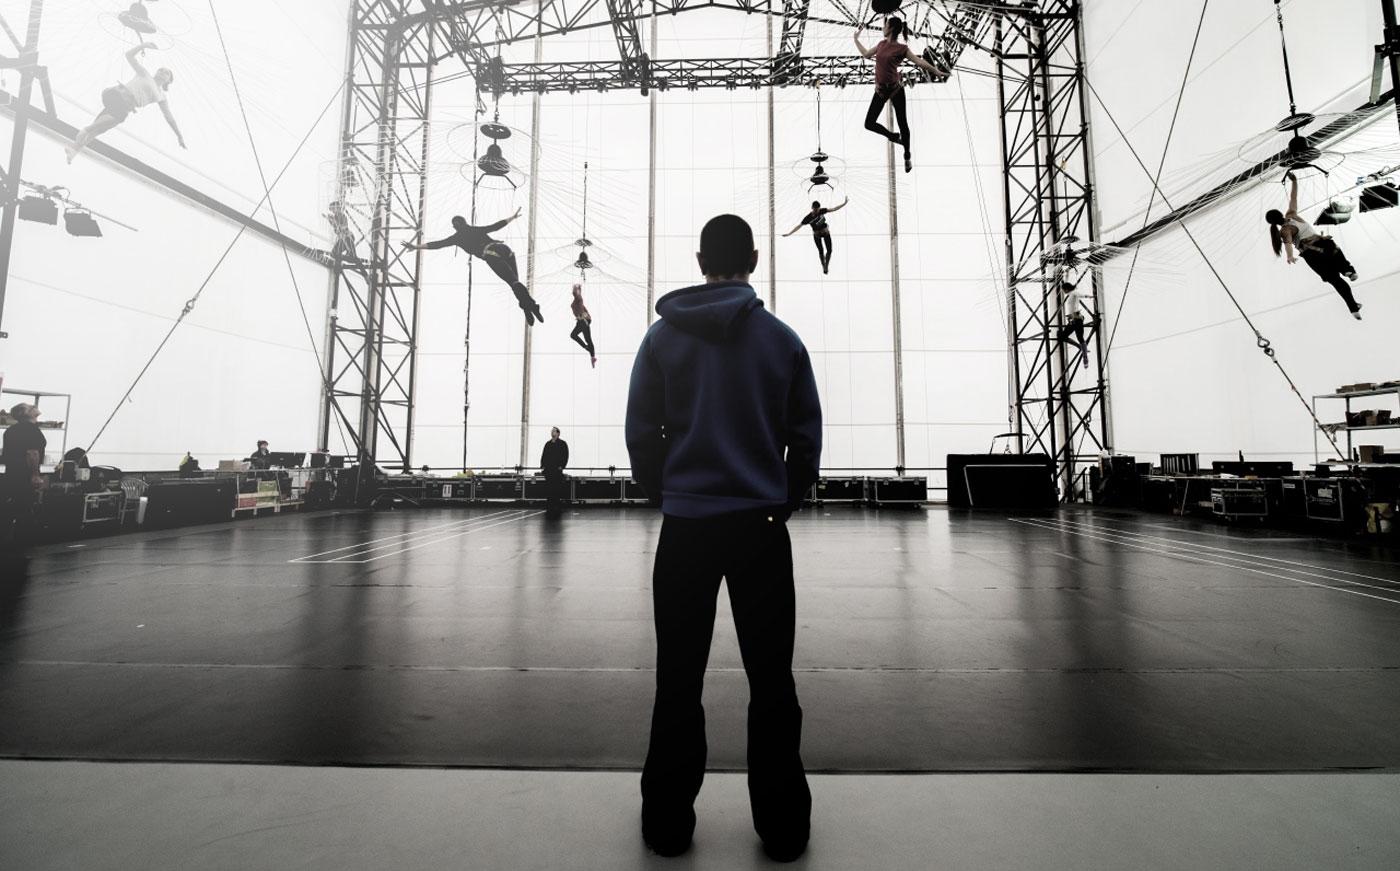 Alex Poulter | Choreographer | Main image